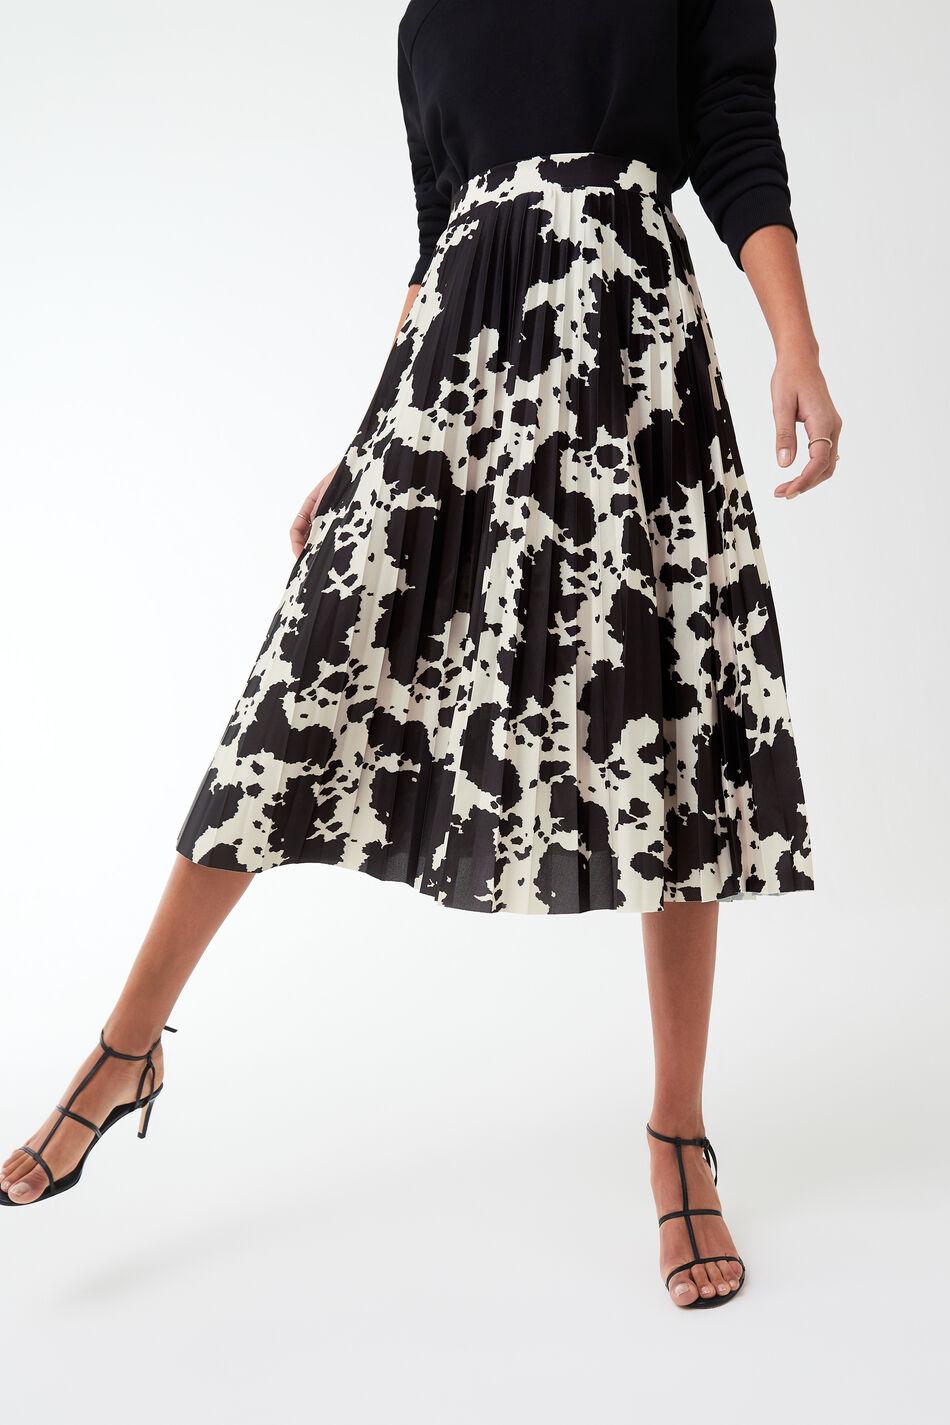 Gina Tricot Evita pleated skirt